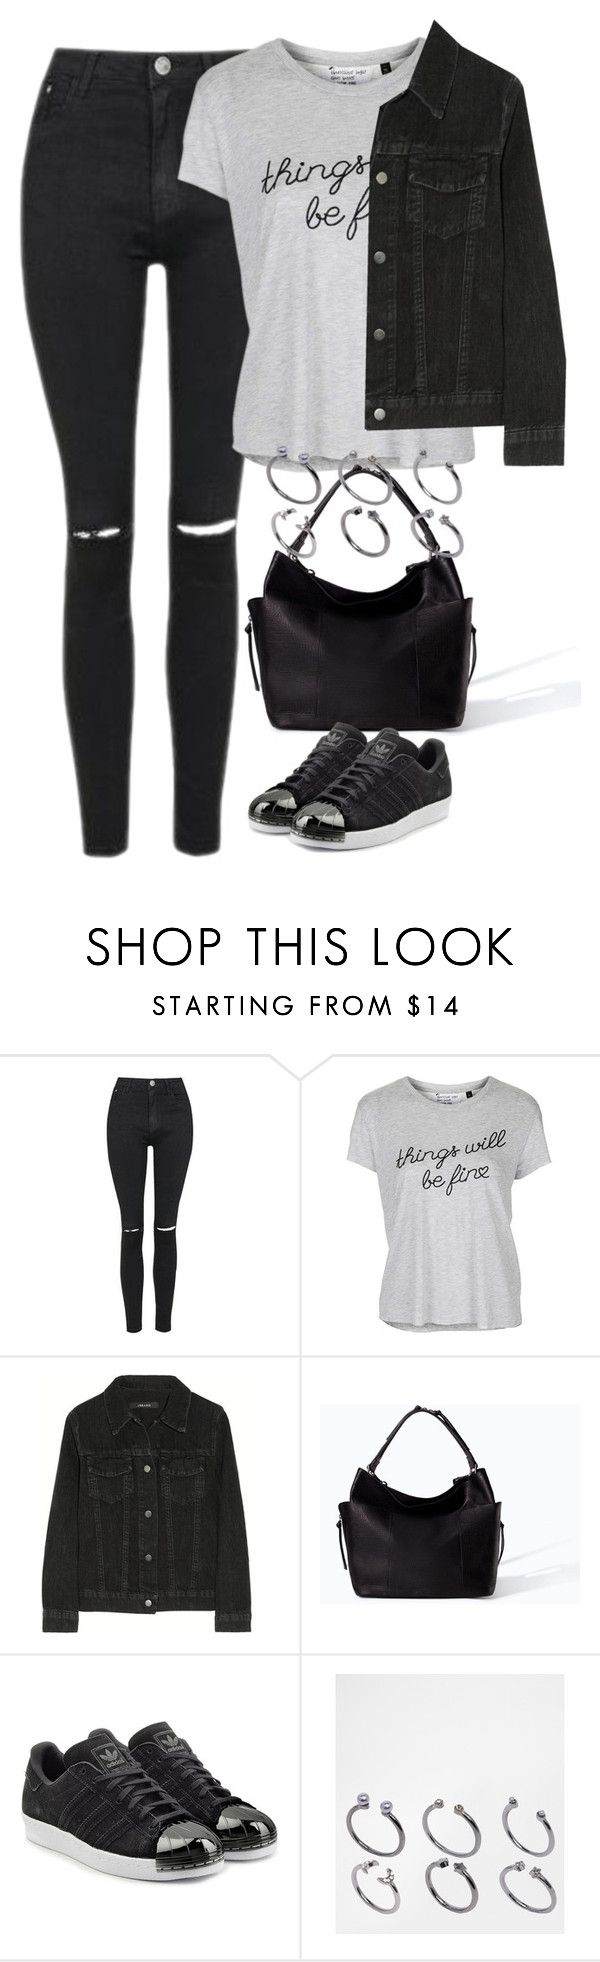 """Untitled #4062"" by keliseblog ❤ liked on Polyvore featuring Topshop, J Brand, Zara, adidas Originals and ASOS"